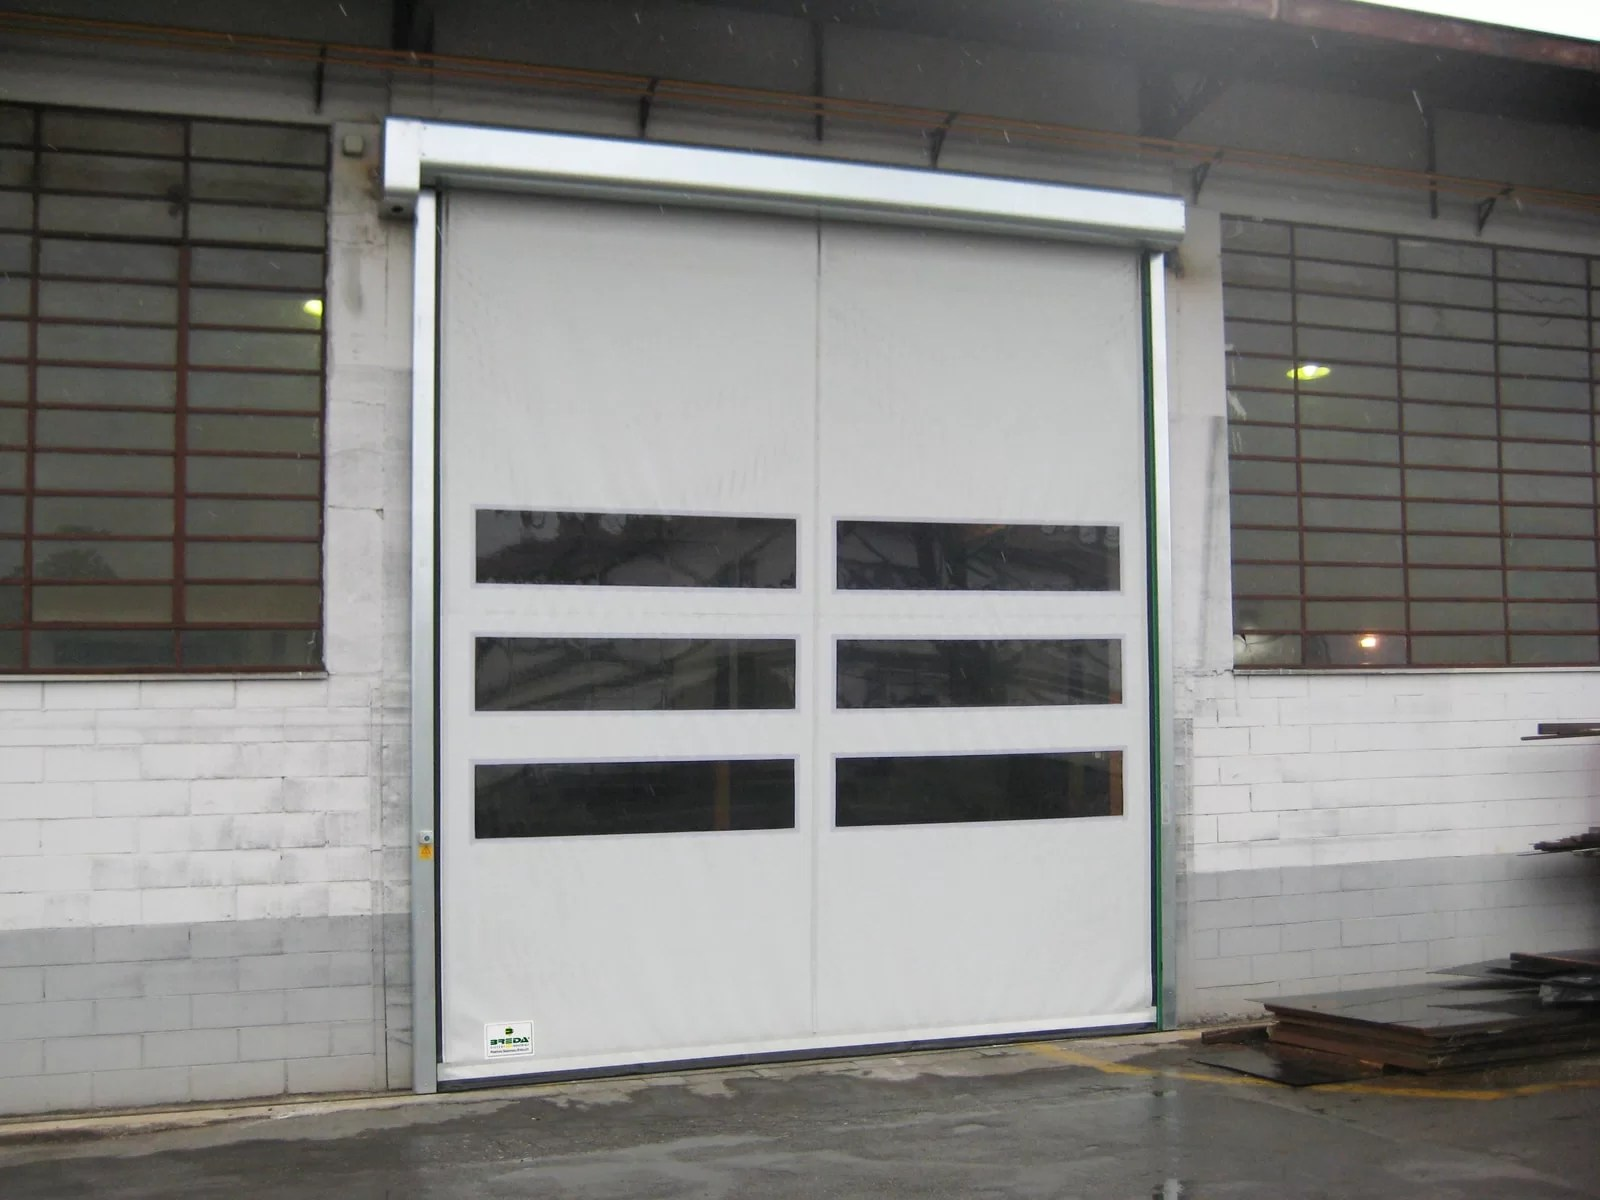 Porta rapida autoriparante ad avvolgimento LAMPO - Bianco RAL 9010